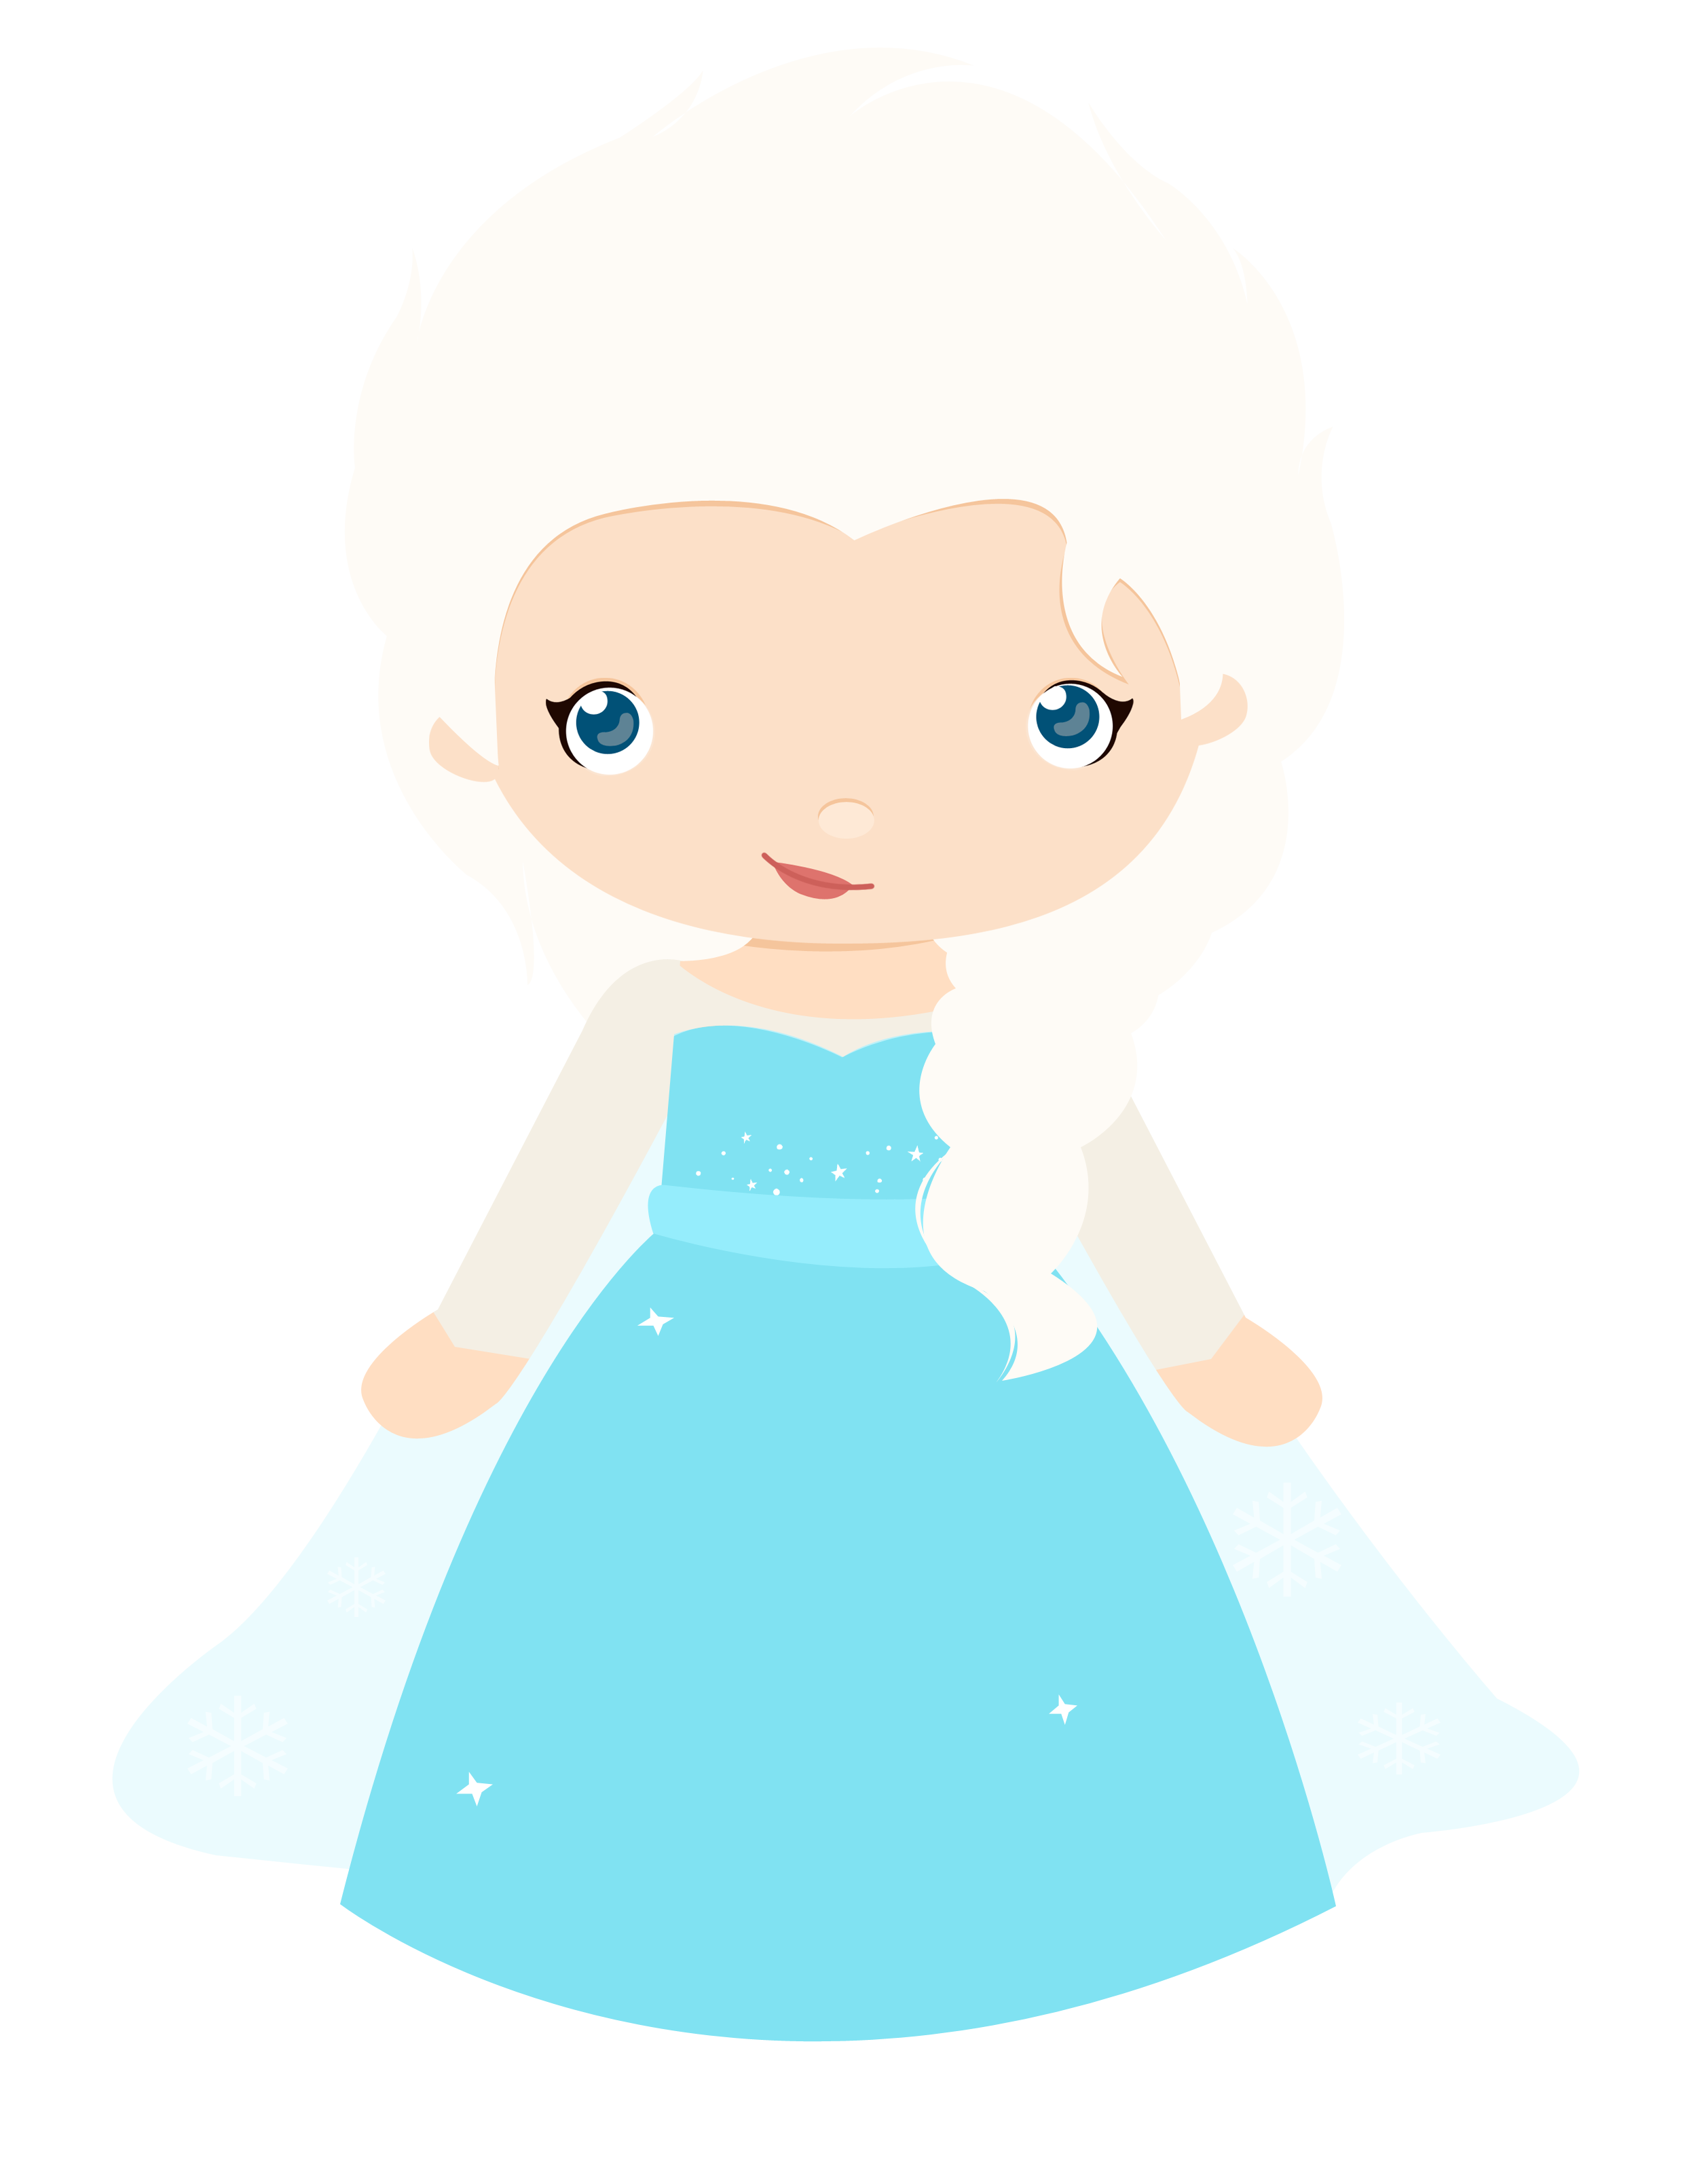 Disney frozen christmas clipart graphic download x disney-frozen-anna-elsa-new-design - i2M1yyyHHZcFL.png - Minus ... graphic download